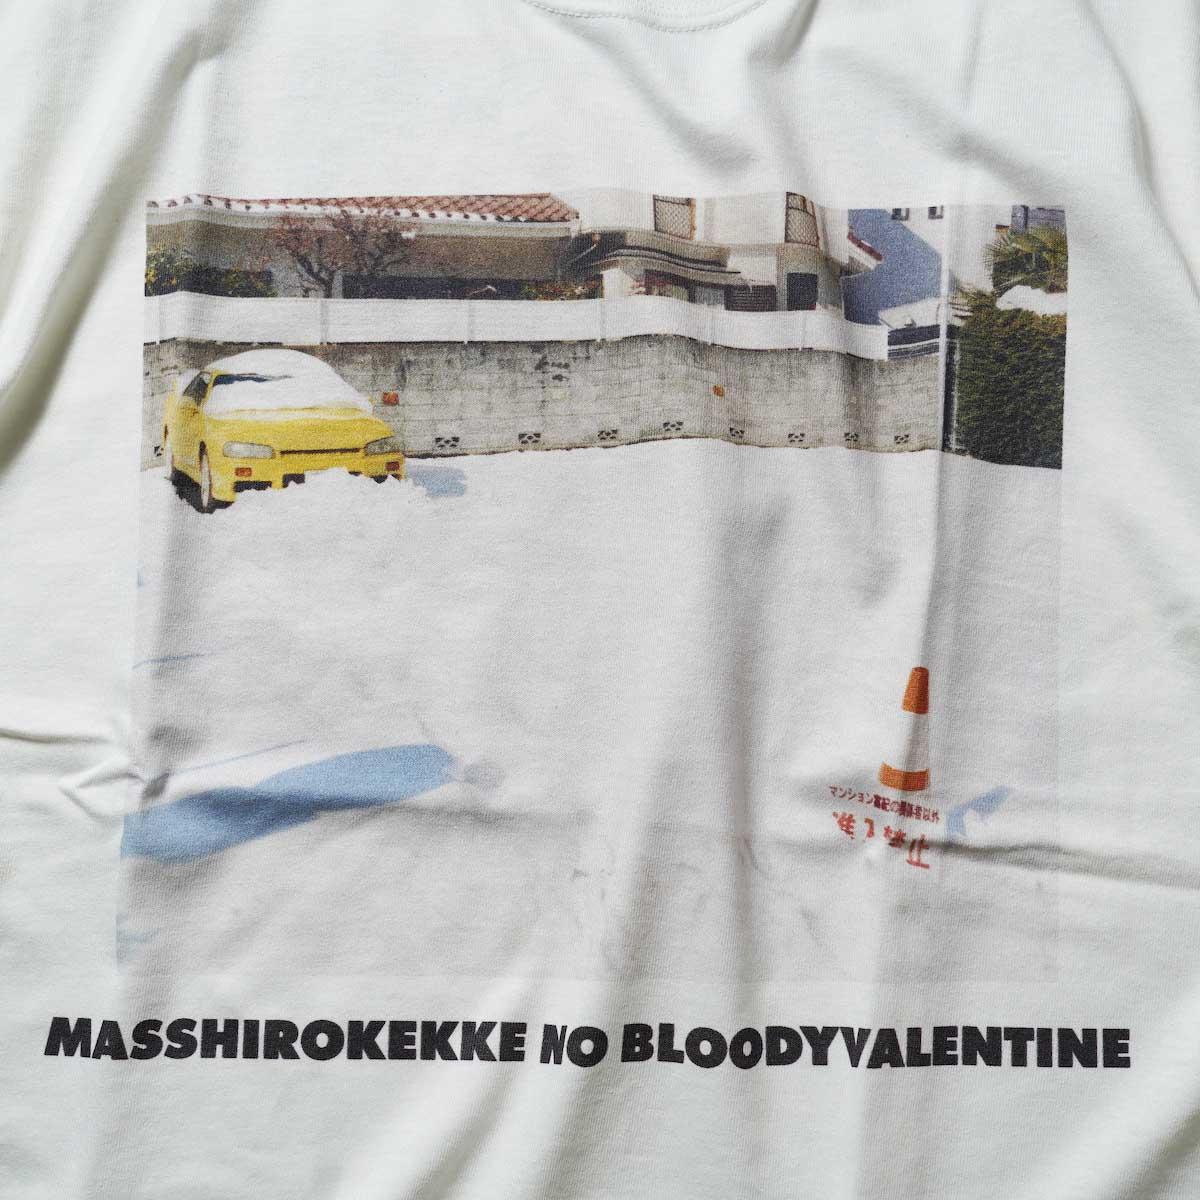 TANGTANG / GASATANG -MASSHIROKEKKE NO BLOODYVALENTINE- プリント